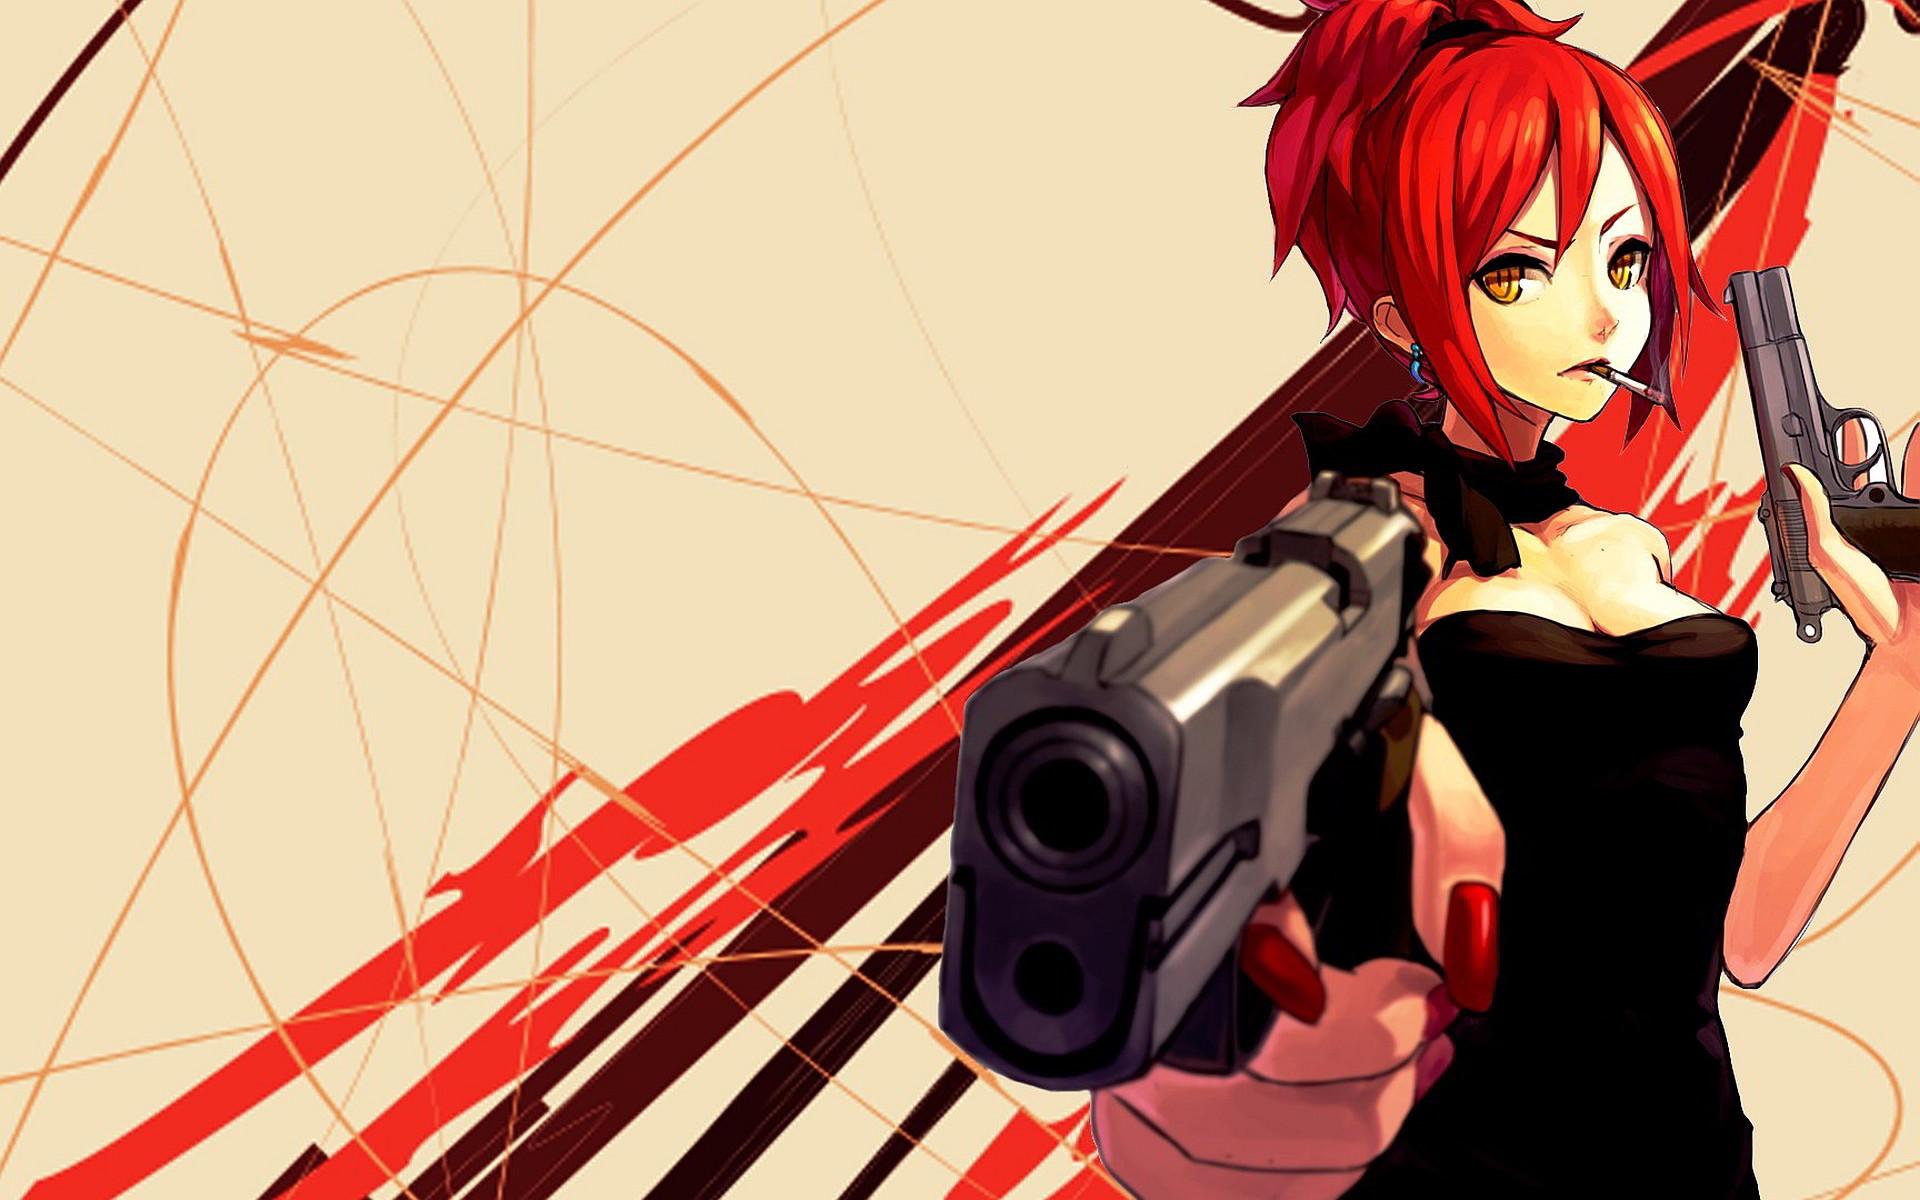 Full HD p Anime Wallpapers, Desktop Backgrounds HD, Pictures Anime  Wallpapers Wallpapers)